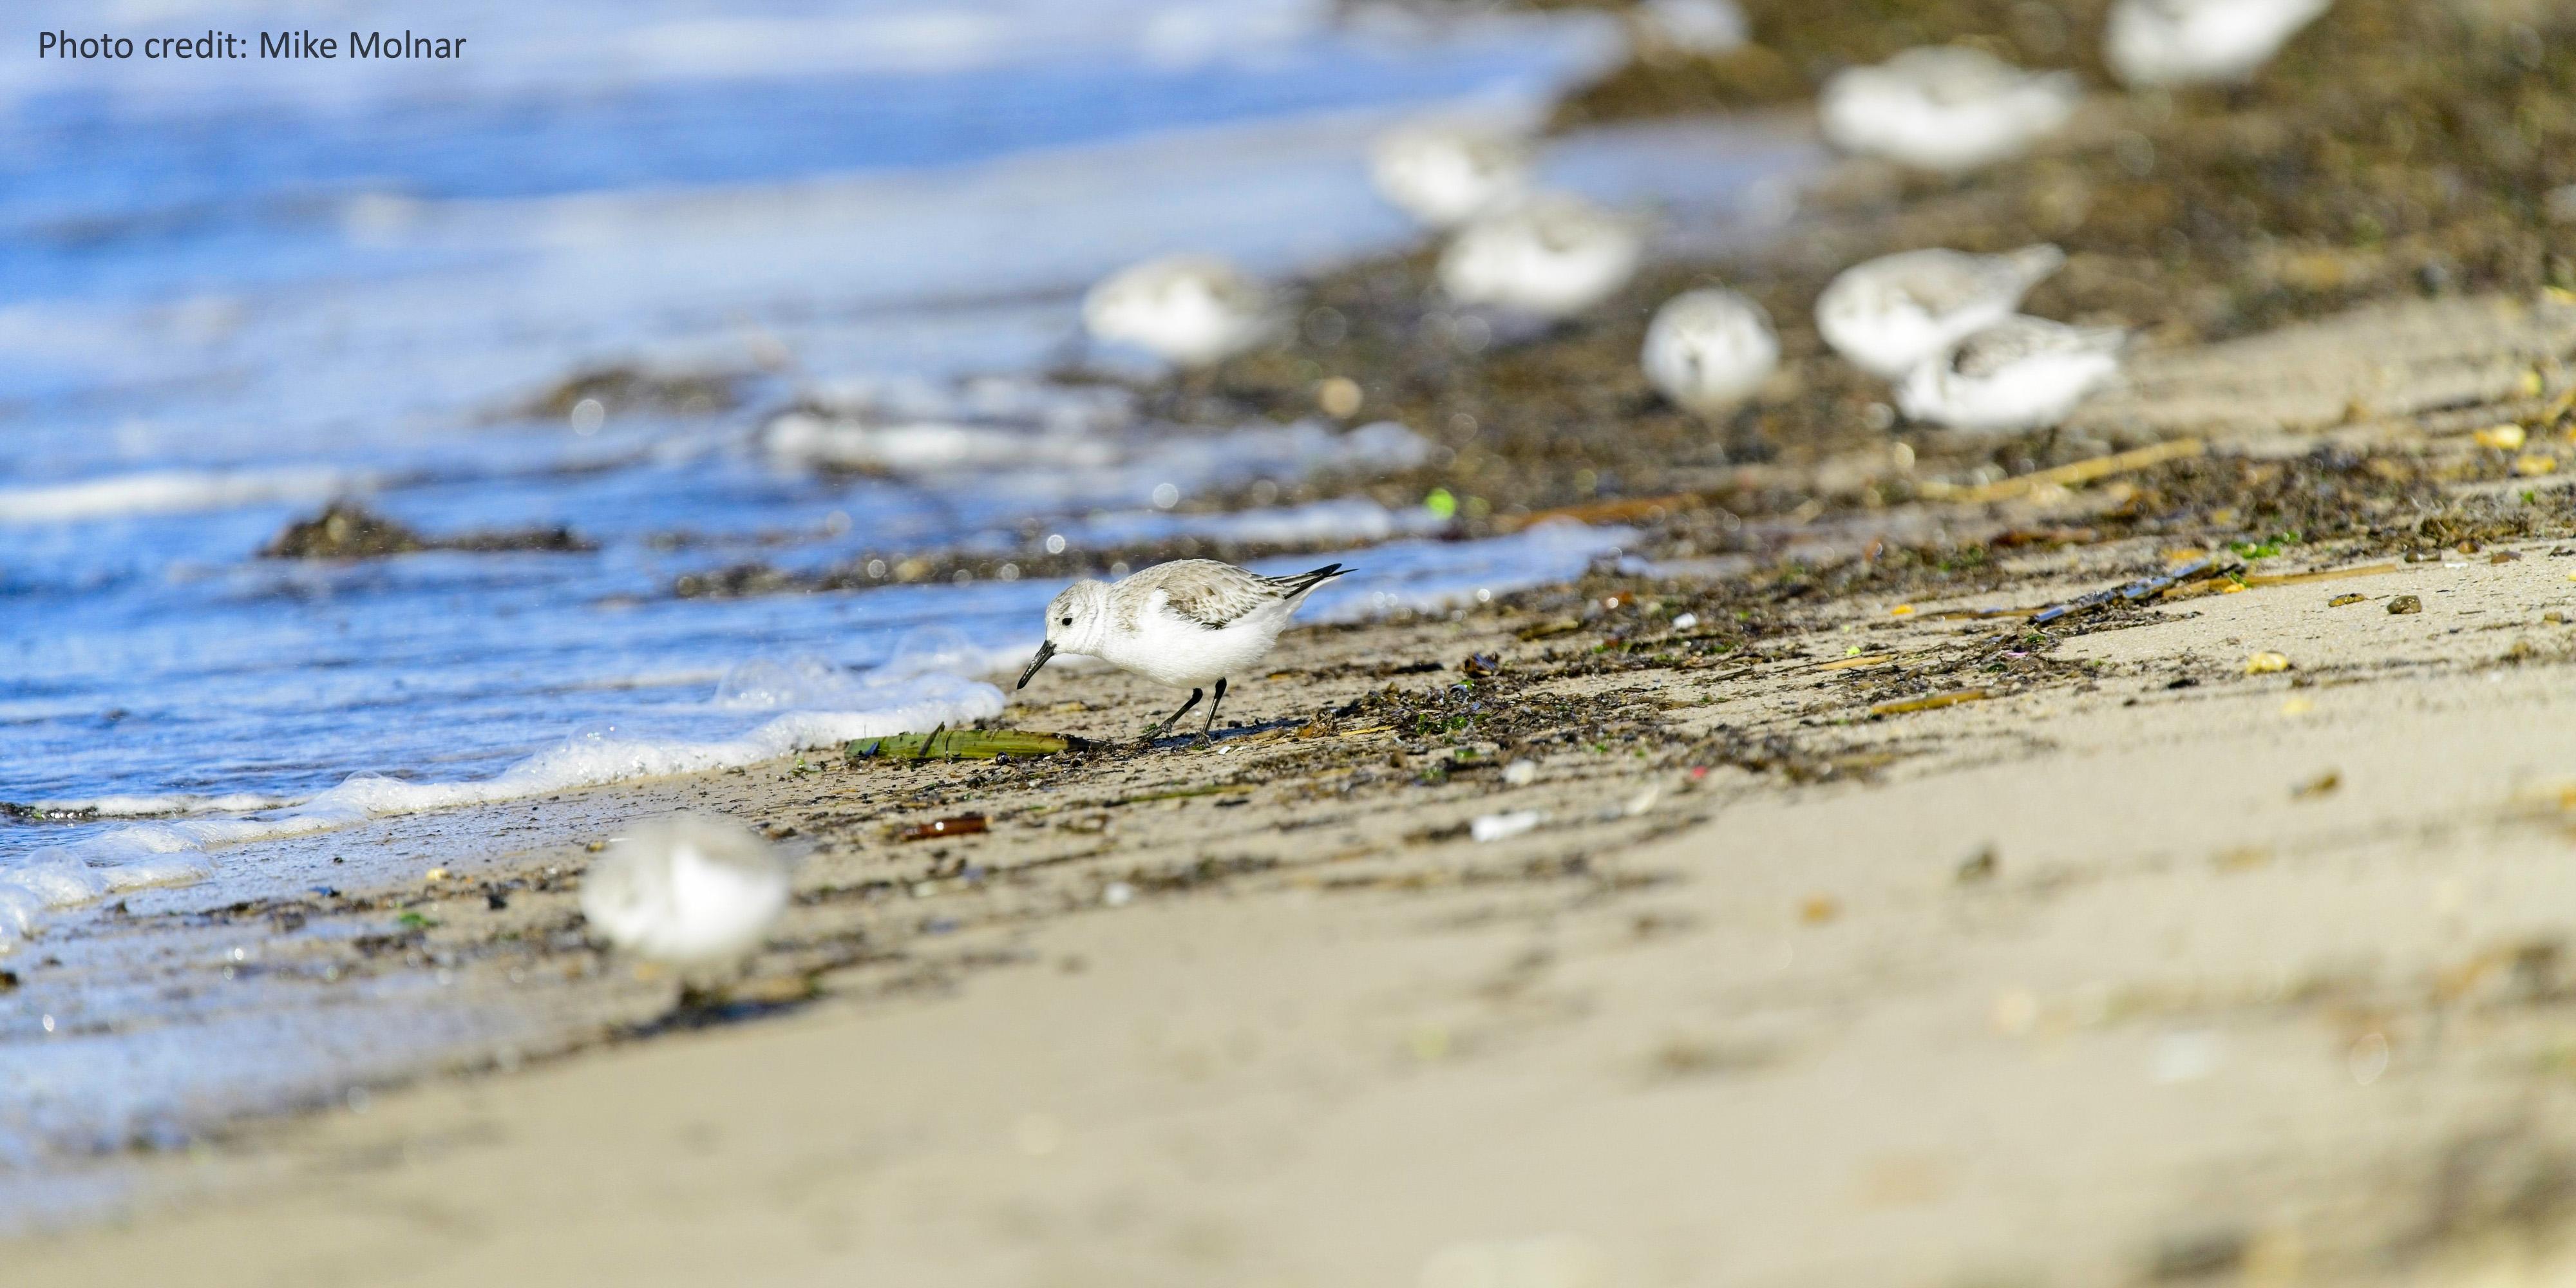 group of sanderlings at Cape Henlopen State Park near Lewes, Delaware